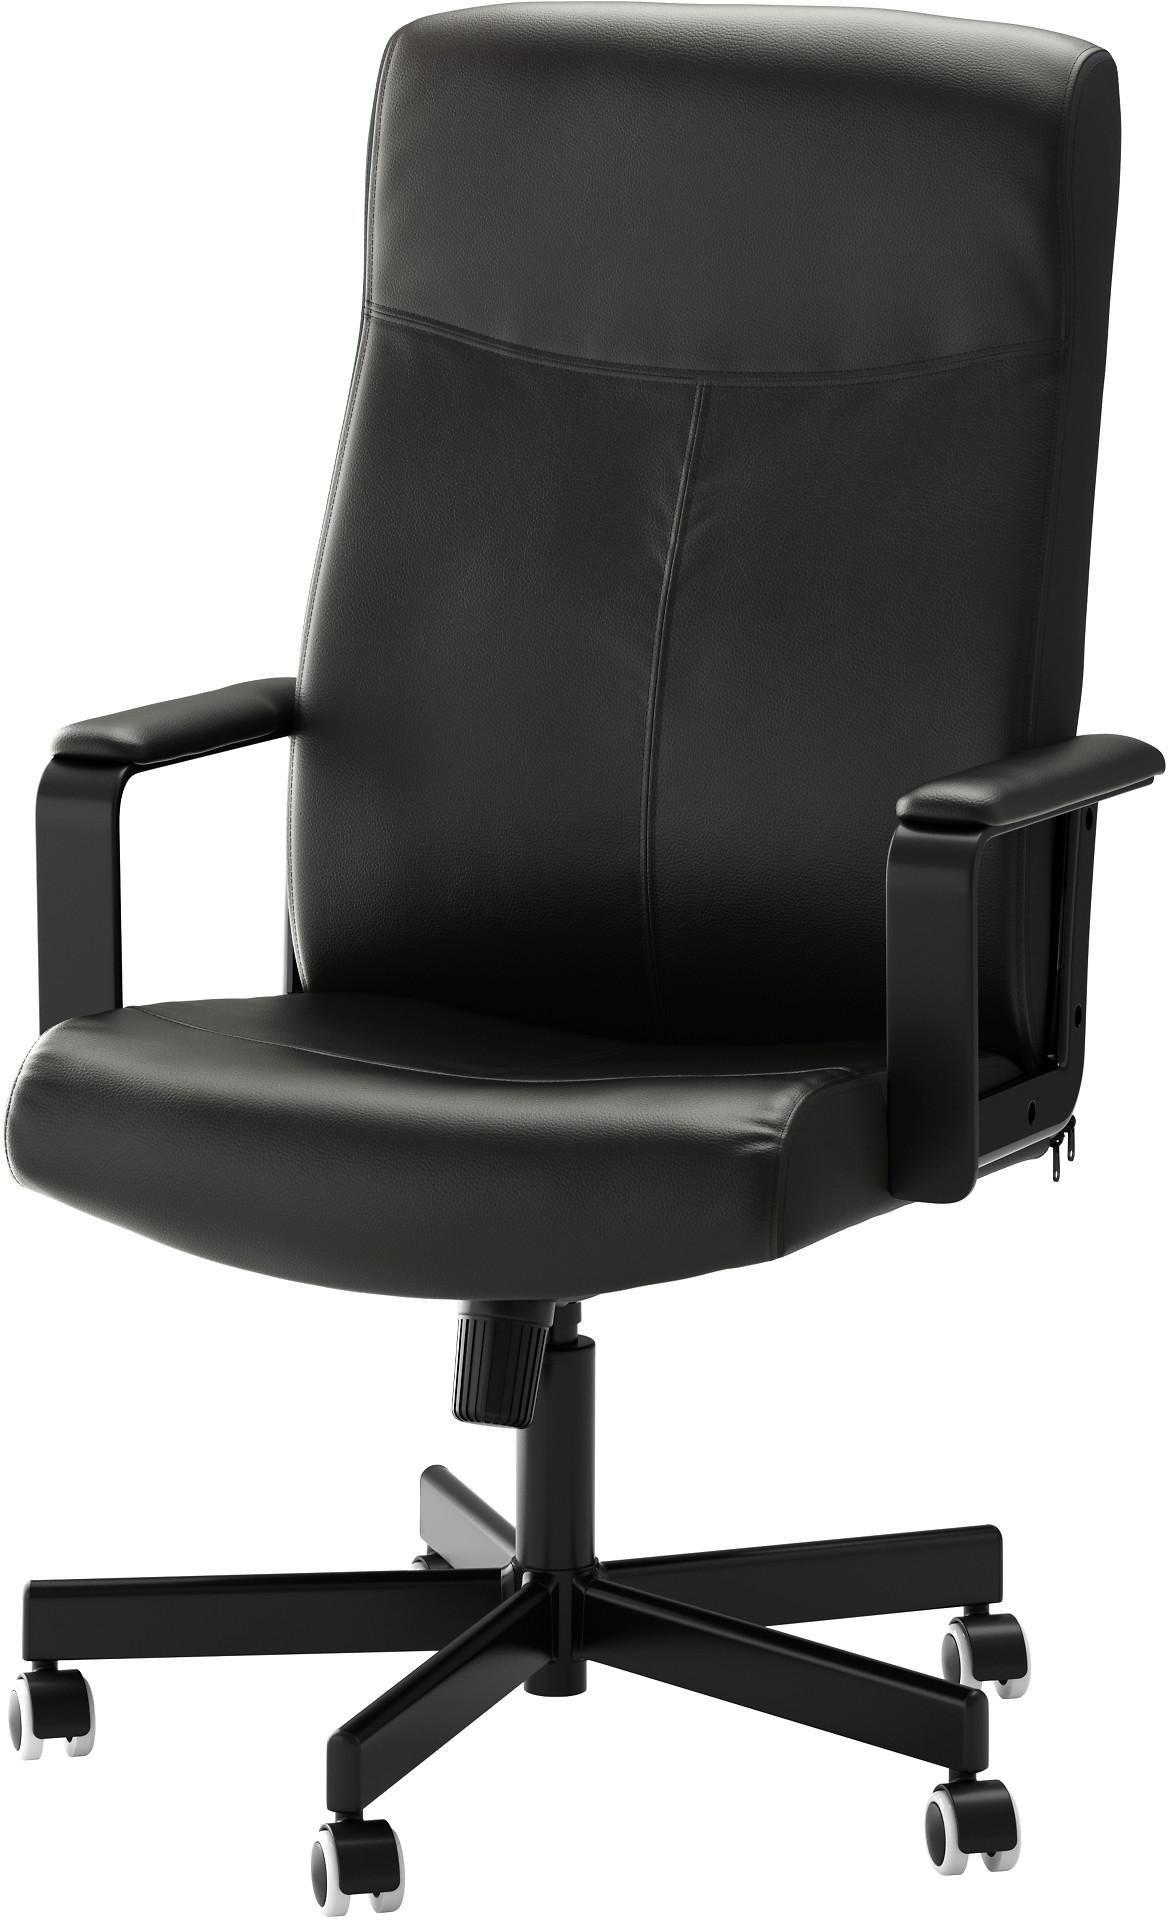 MALKOLM Swivel chair - Bomstad black, - IKEA